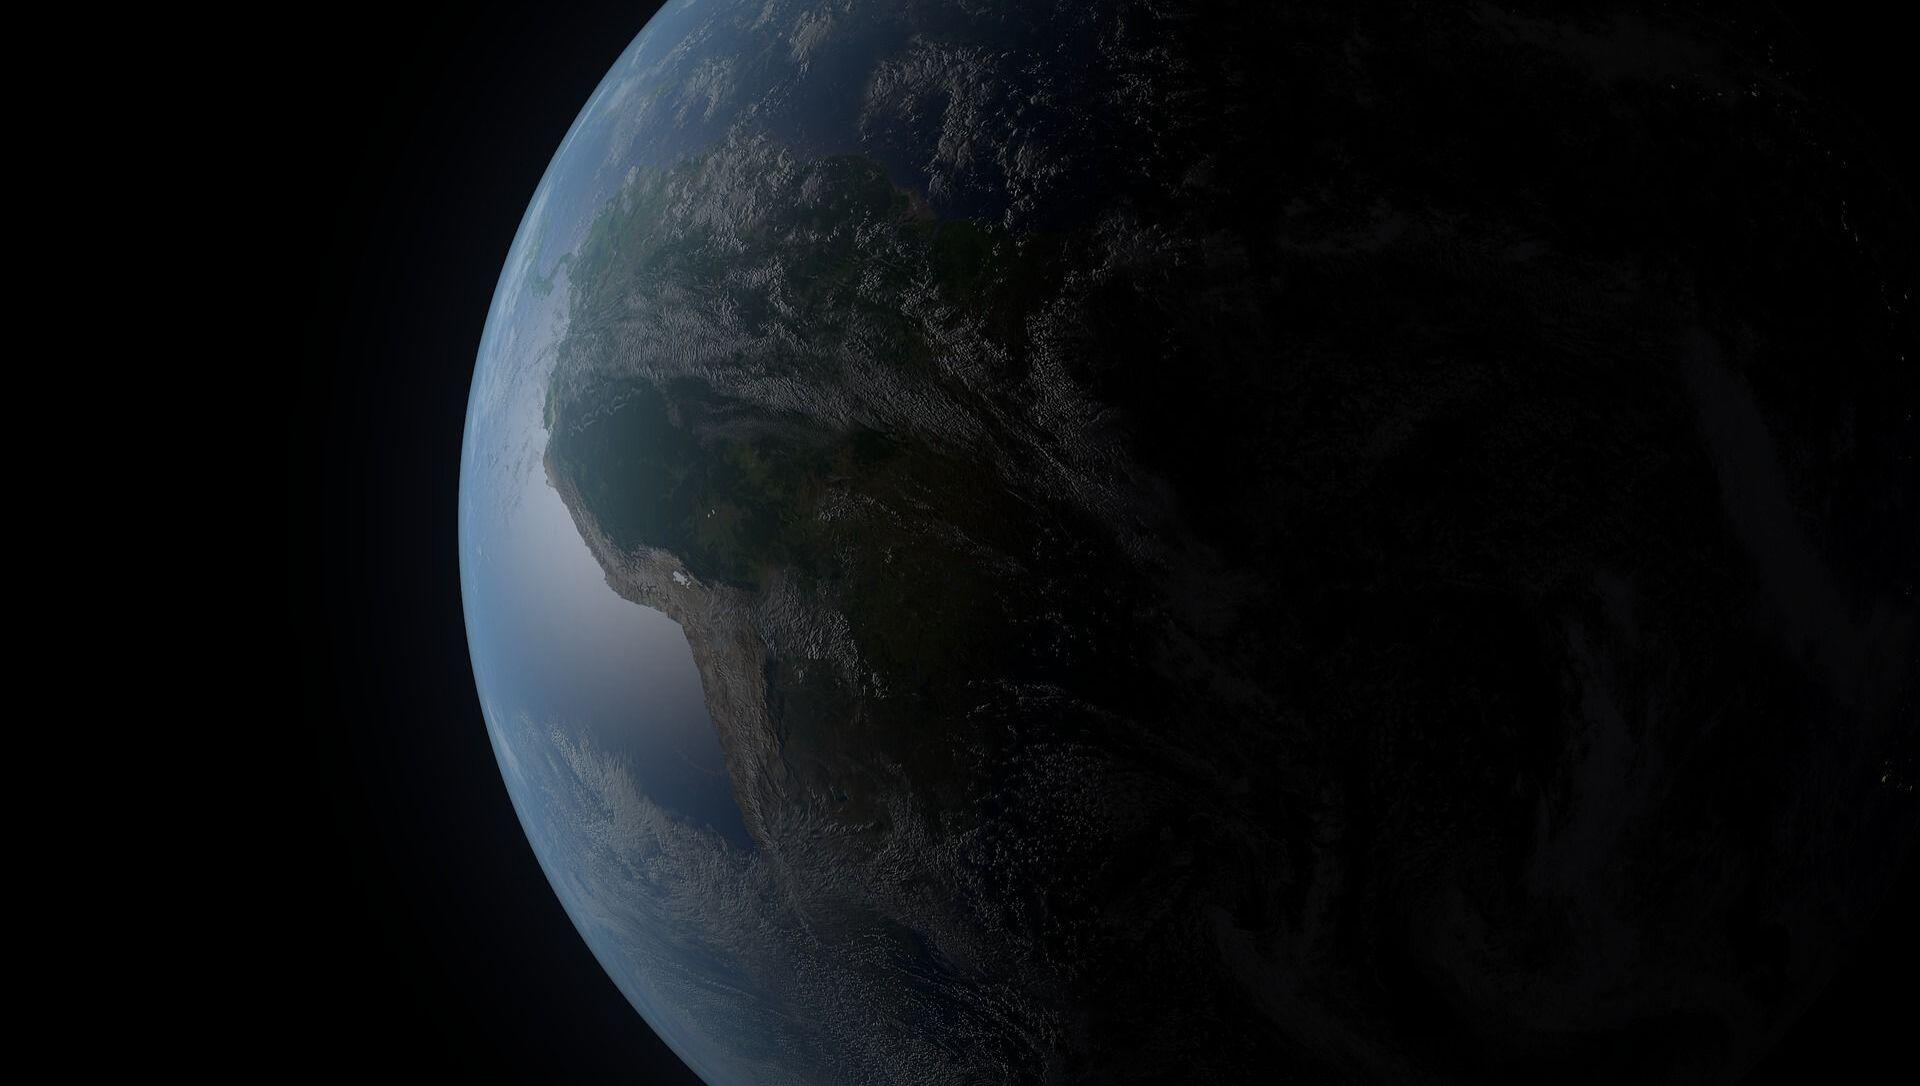 Планета Зямля, архіўны фотаздымак - Sputnik Беларусь, 1920, 14.02.2021